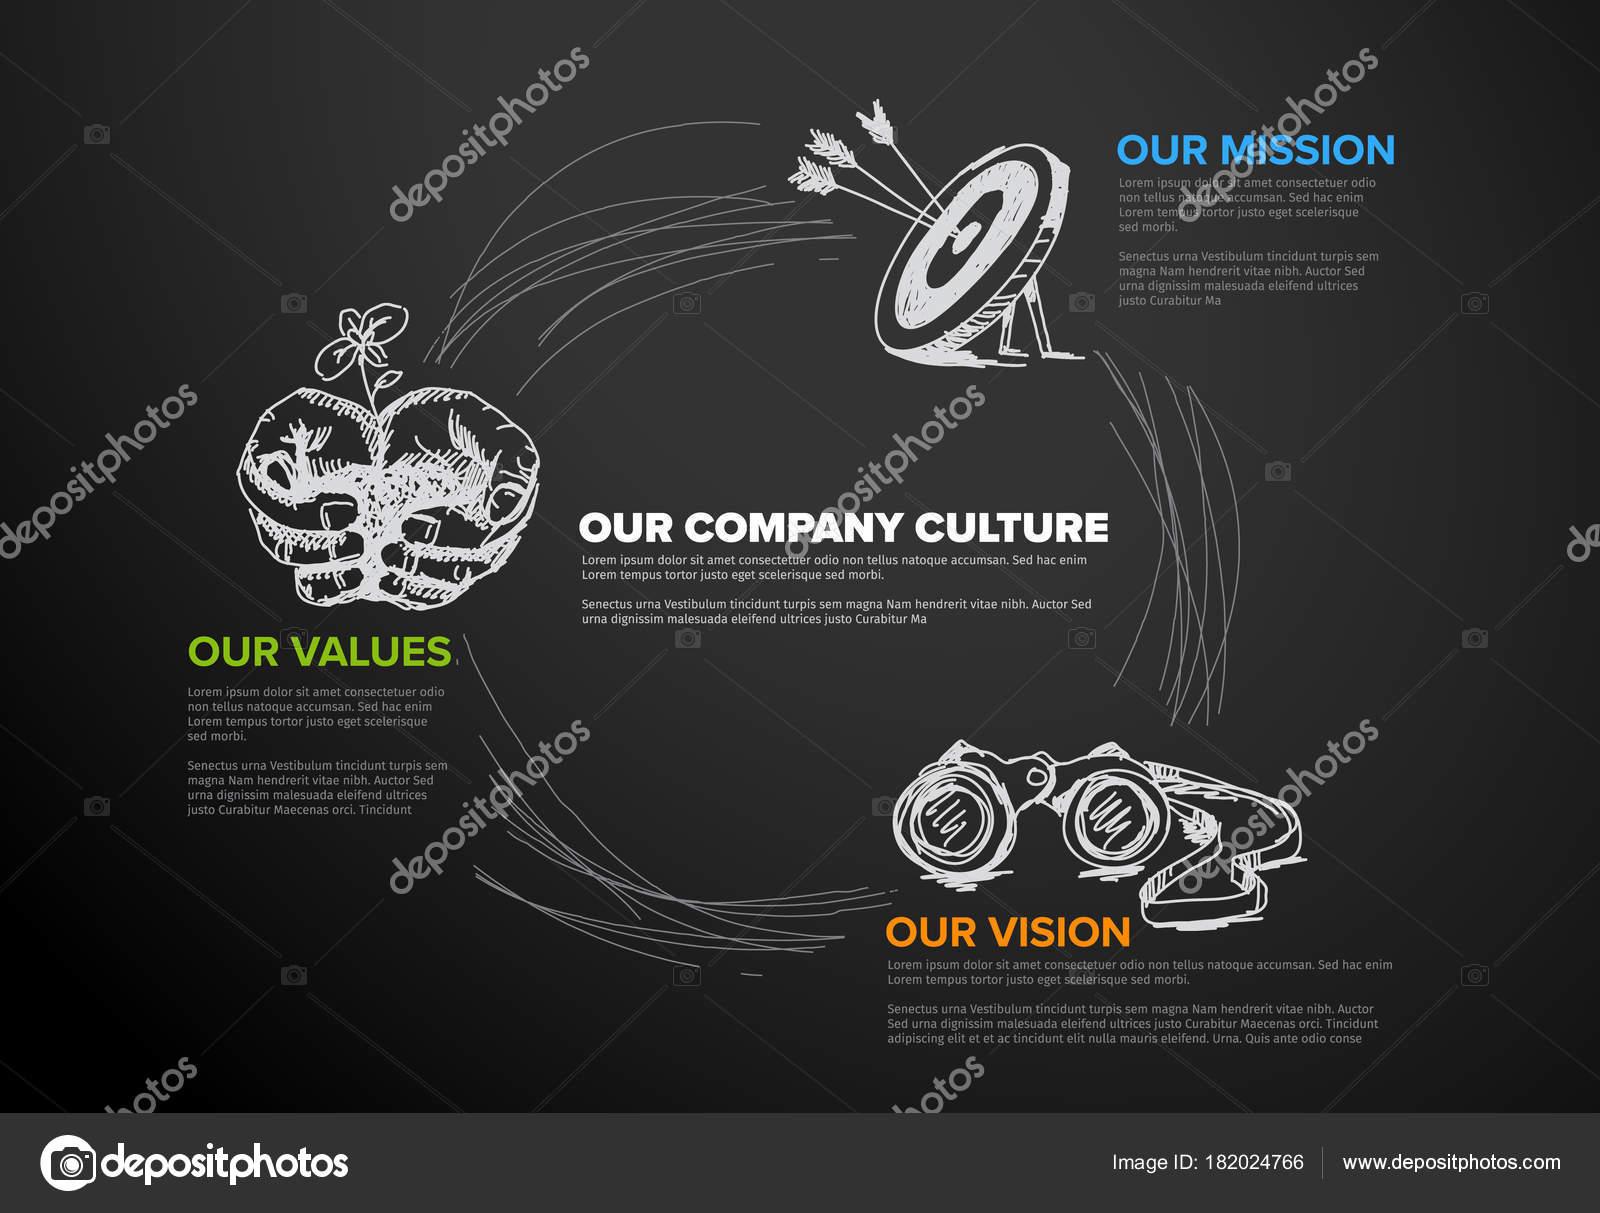 Vector mission vision values diagram schema infographic hand drawn vector mission vision values diagram schema infographic hand drawn icons stock vector ccuart Images